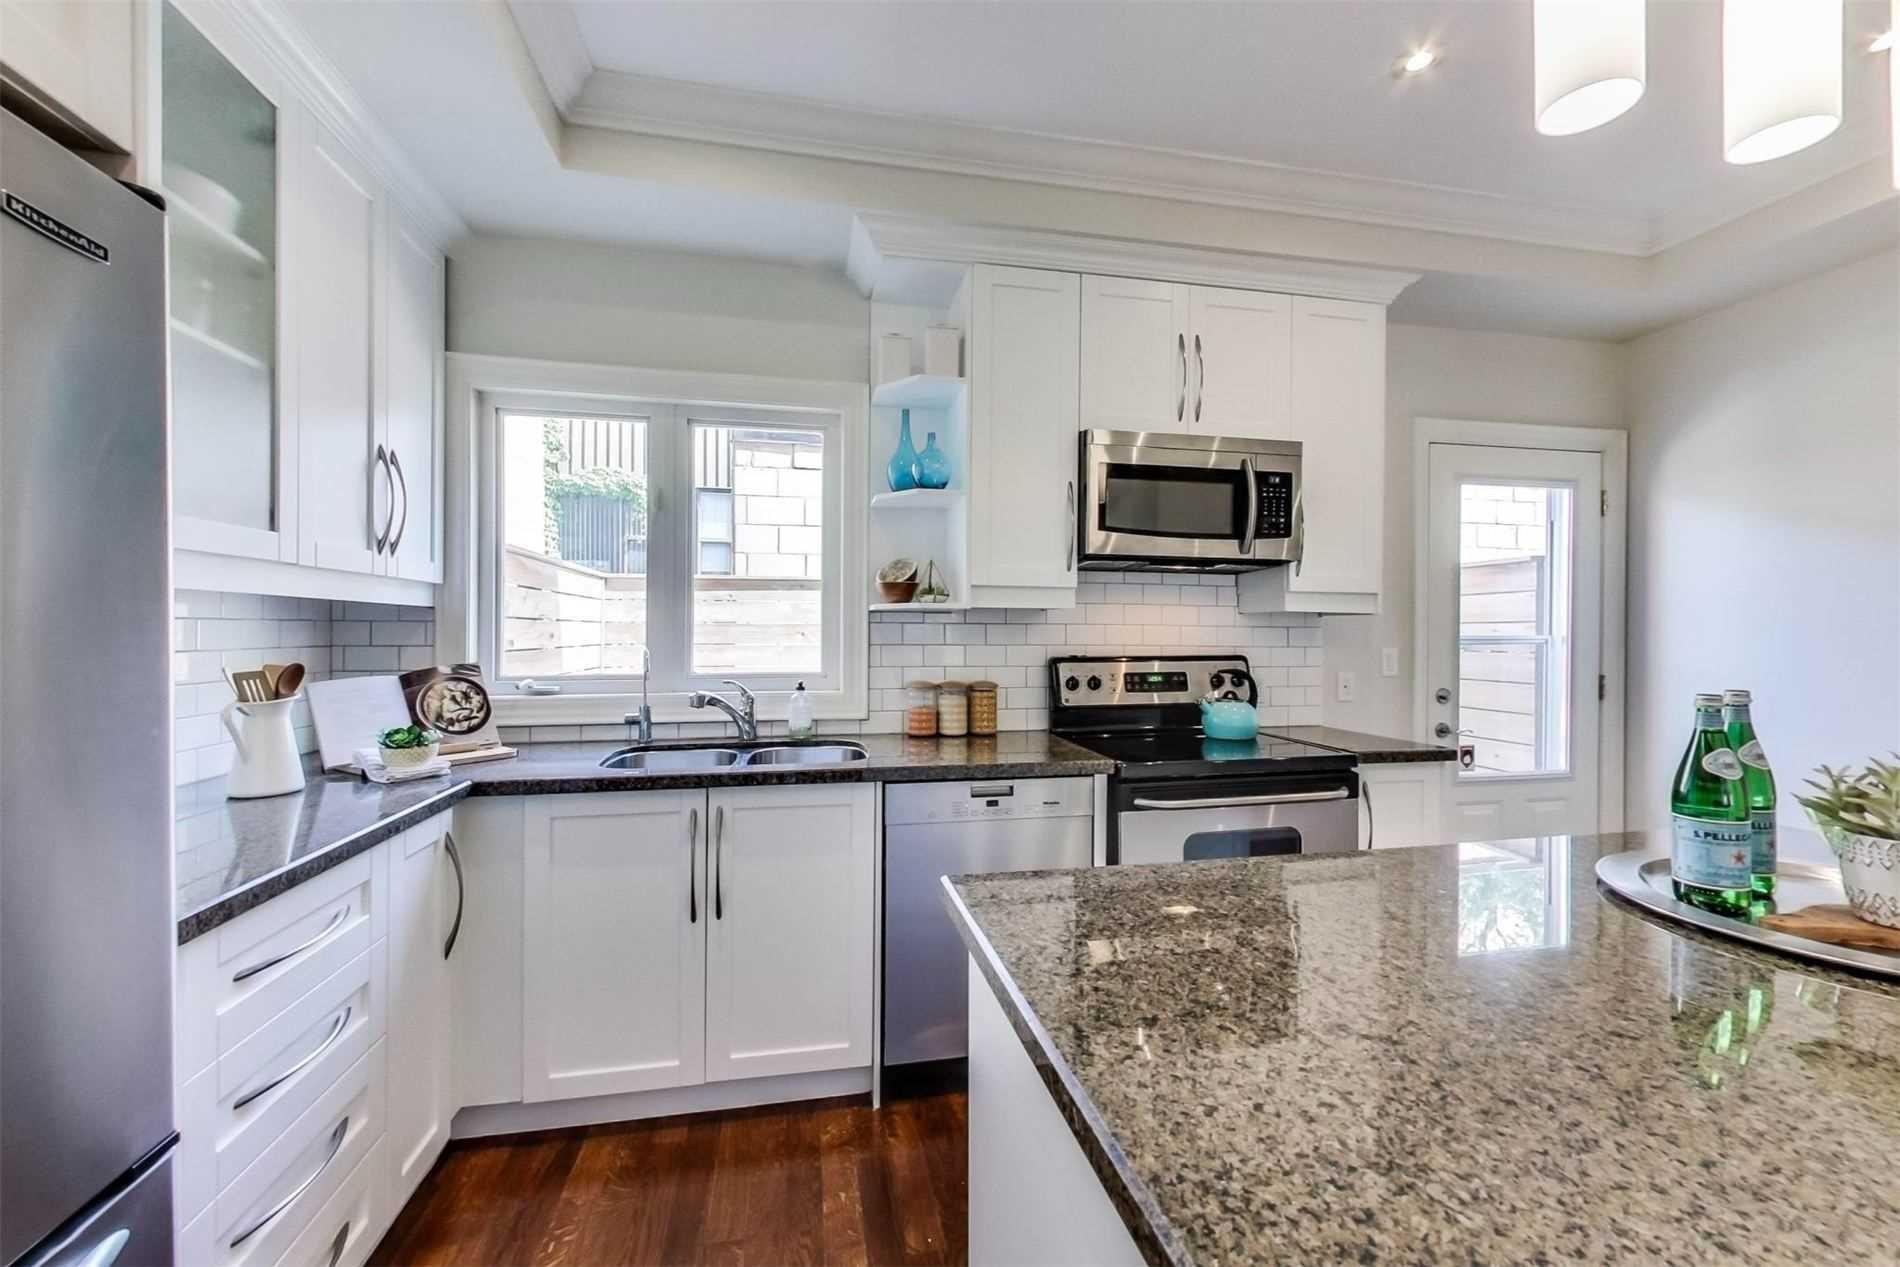 Photo 11: Photos: 213 Heward Avenue in Toronto: South Riverdale House (3-Storey) for sale (Toronto E01)  : MLS®# E4941877